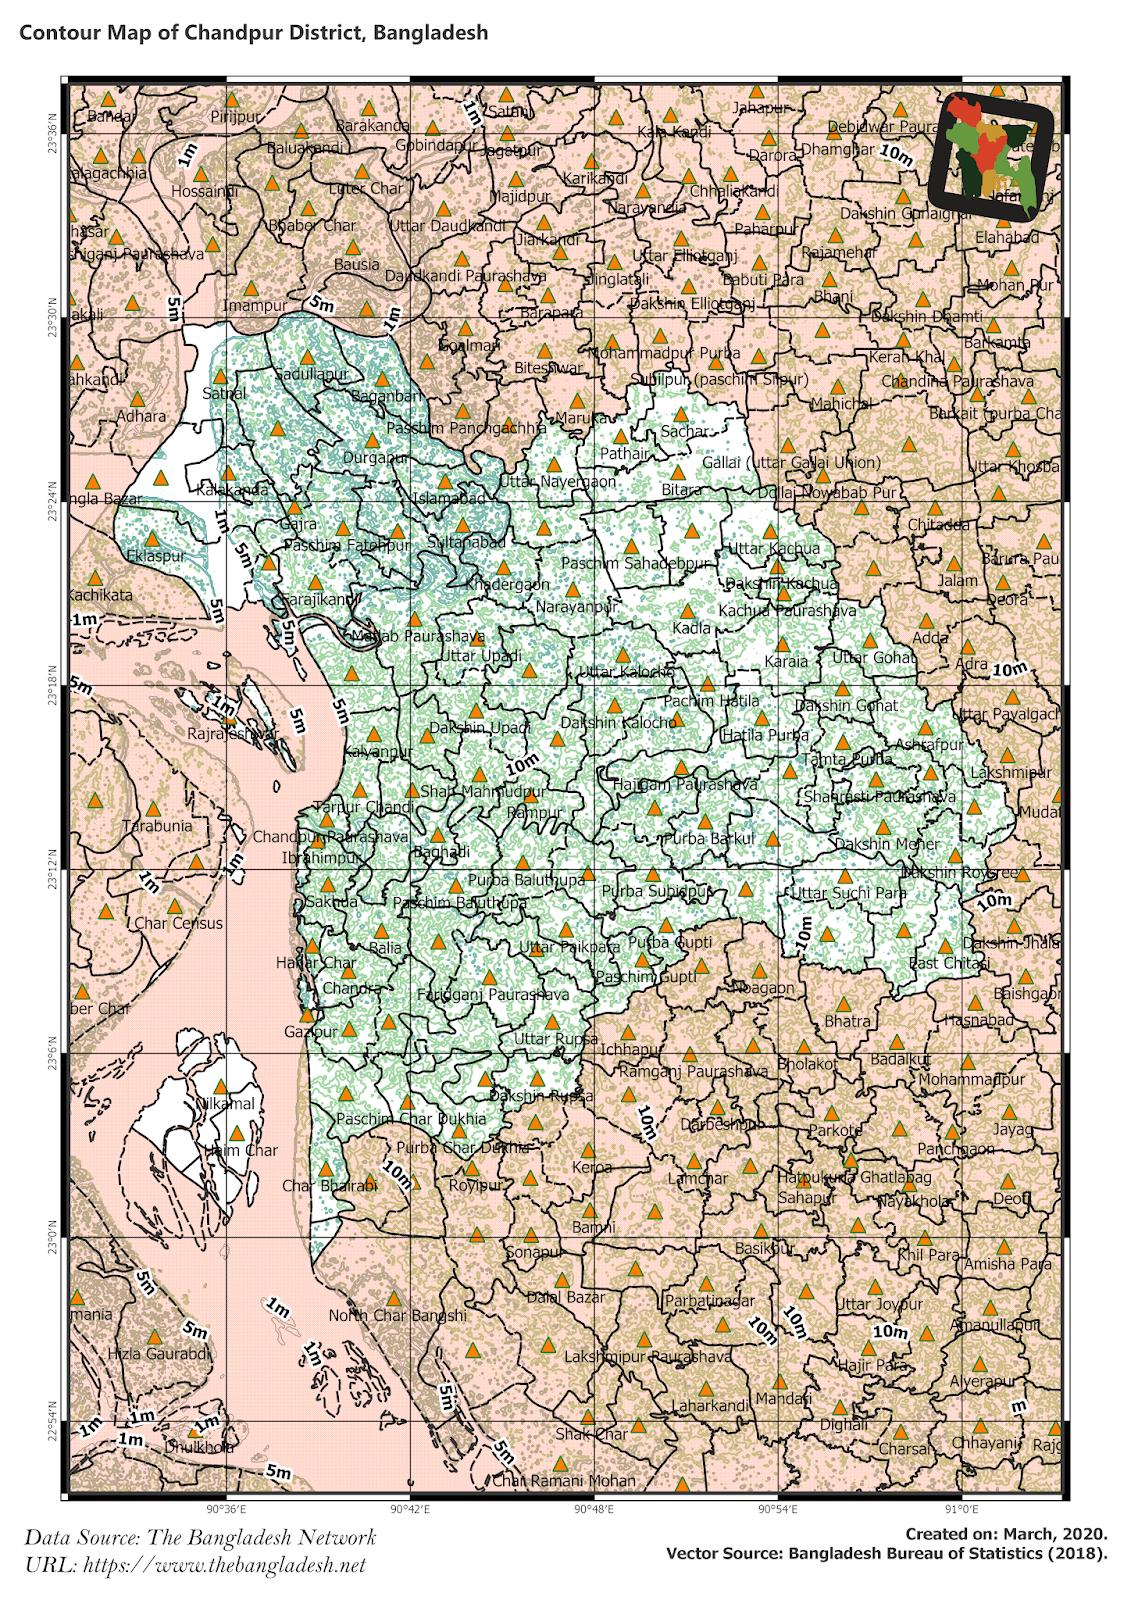 Elevation Map of Chandpur District of Bangladesh